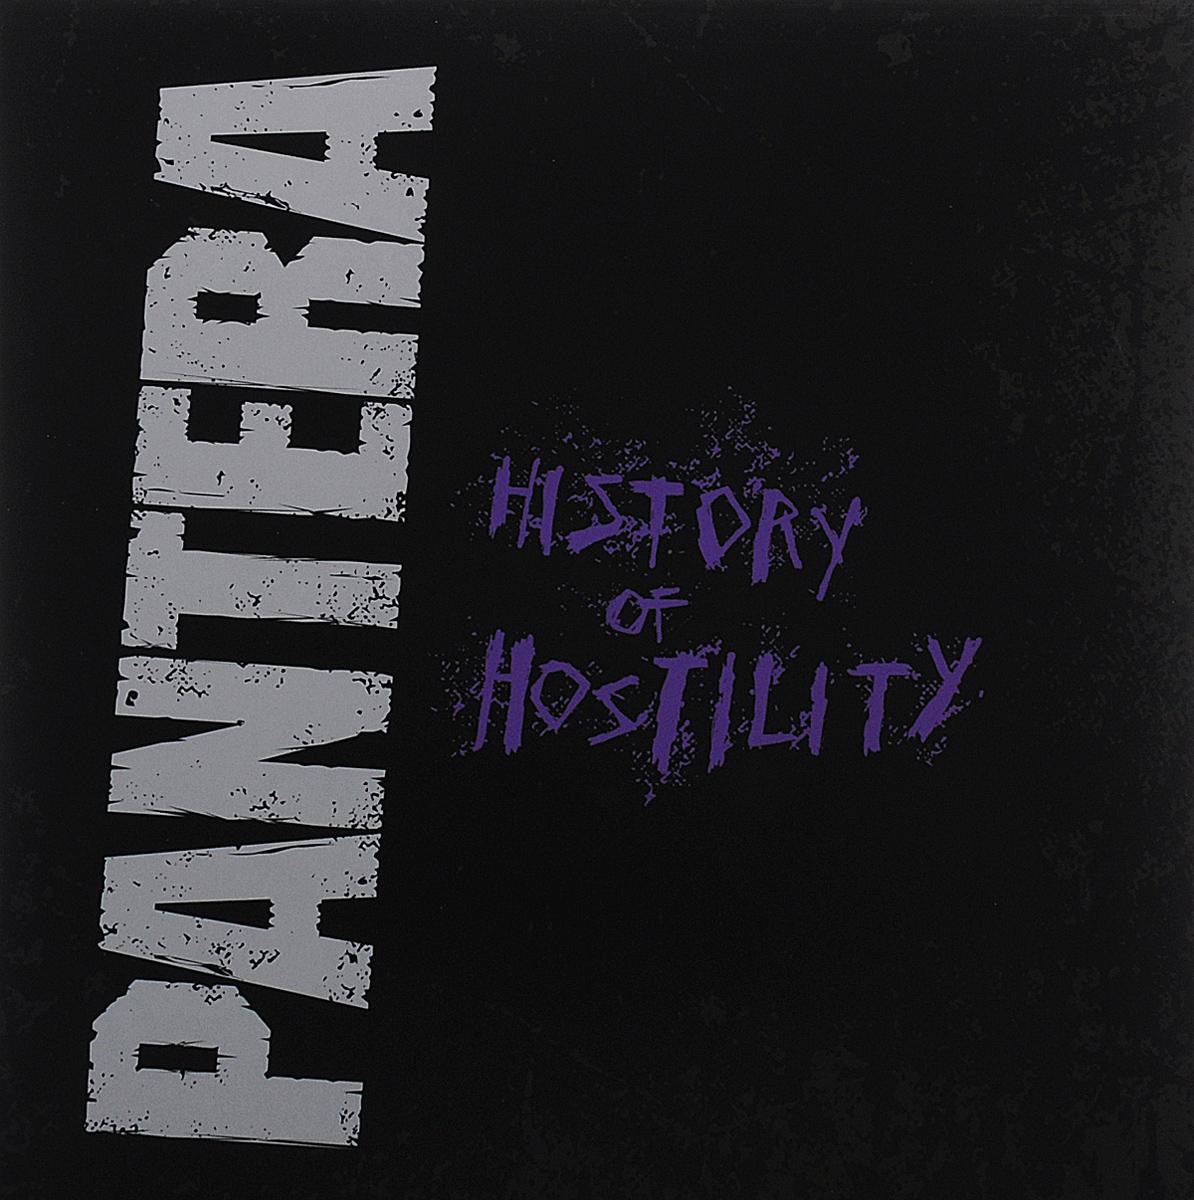 Pantera Pantera. History Of Hostility (LP) concise history of western music 2e im